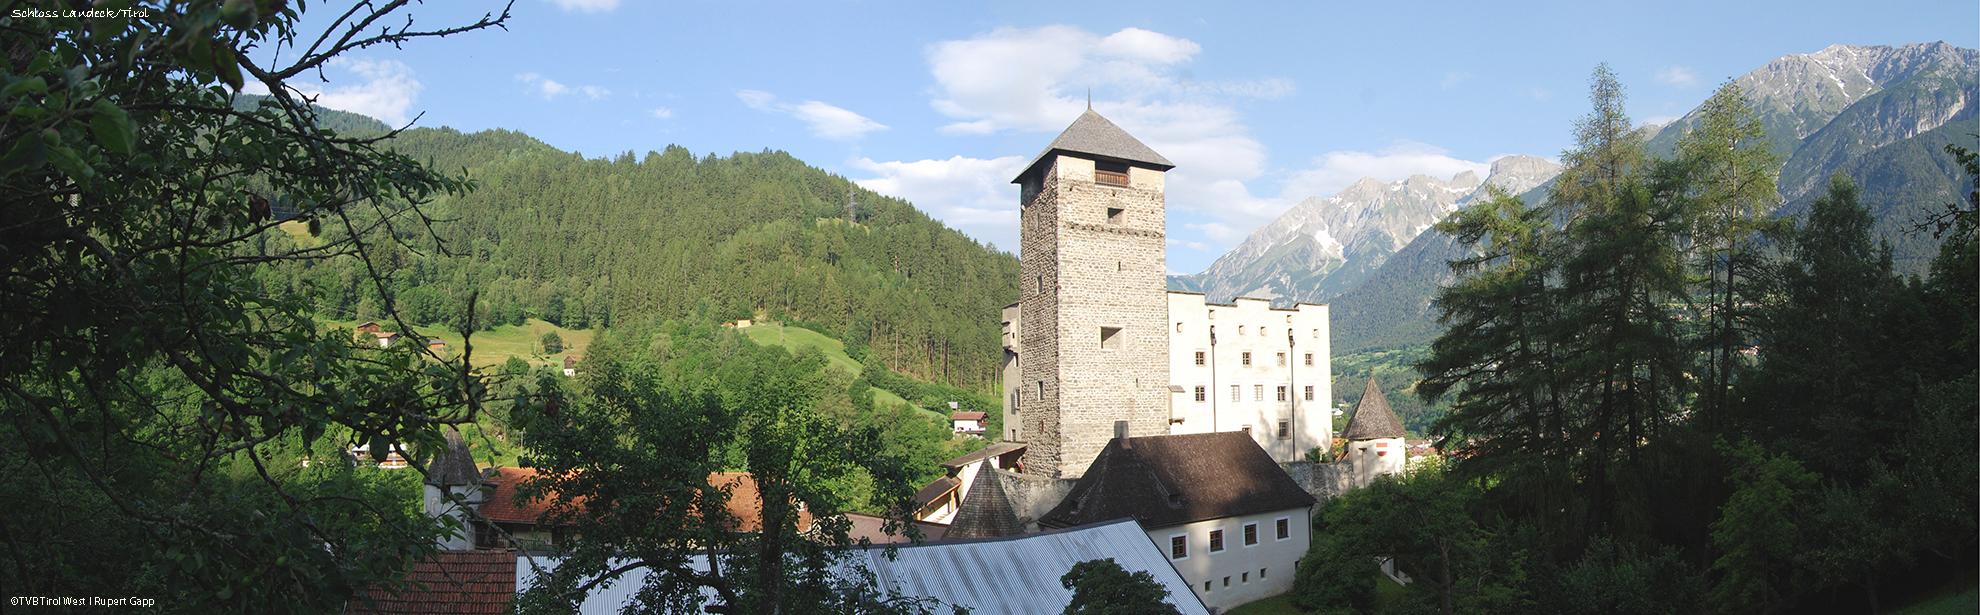 OArchiv_TVB_TirolWest_Rupert_Gapp_Schloss_Landeck